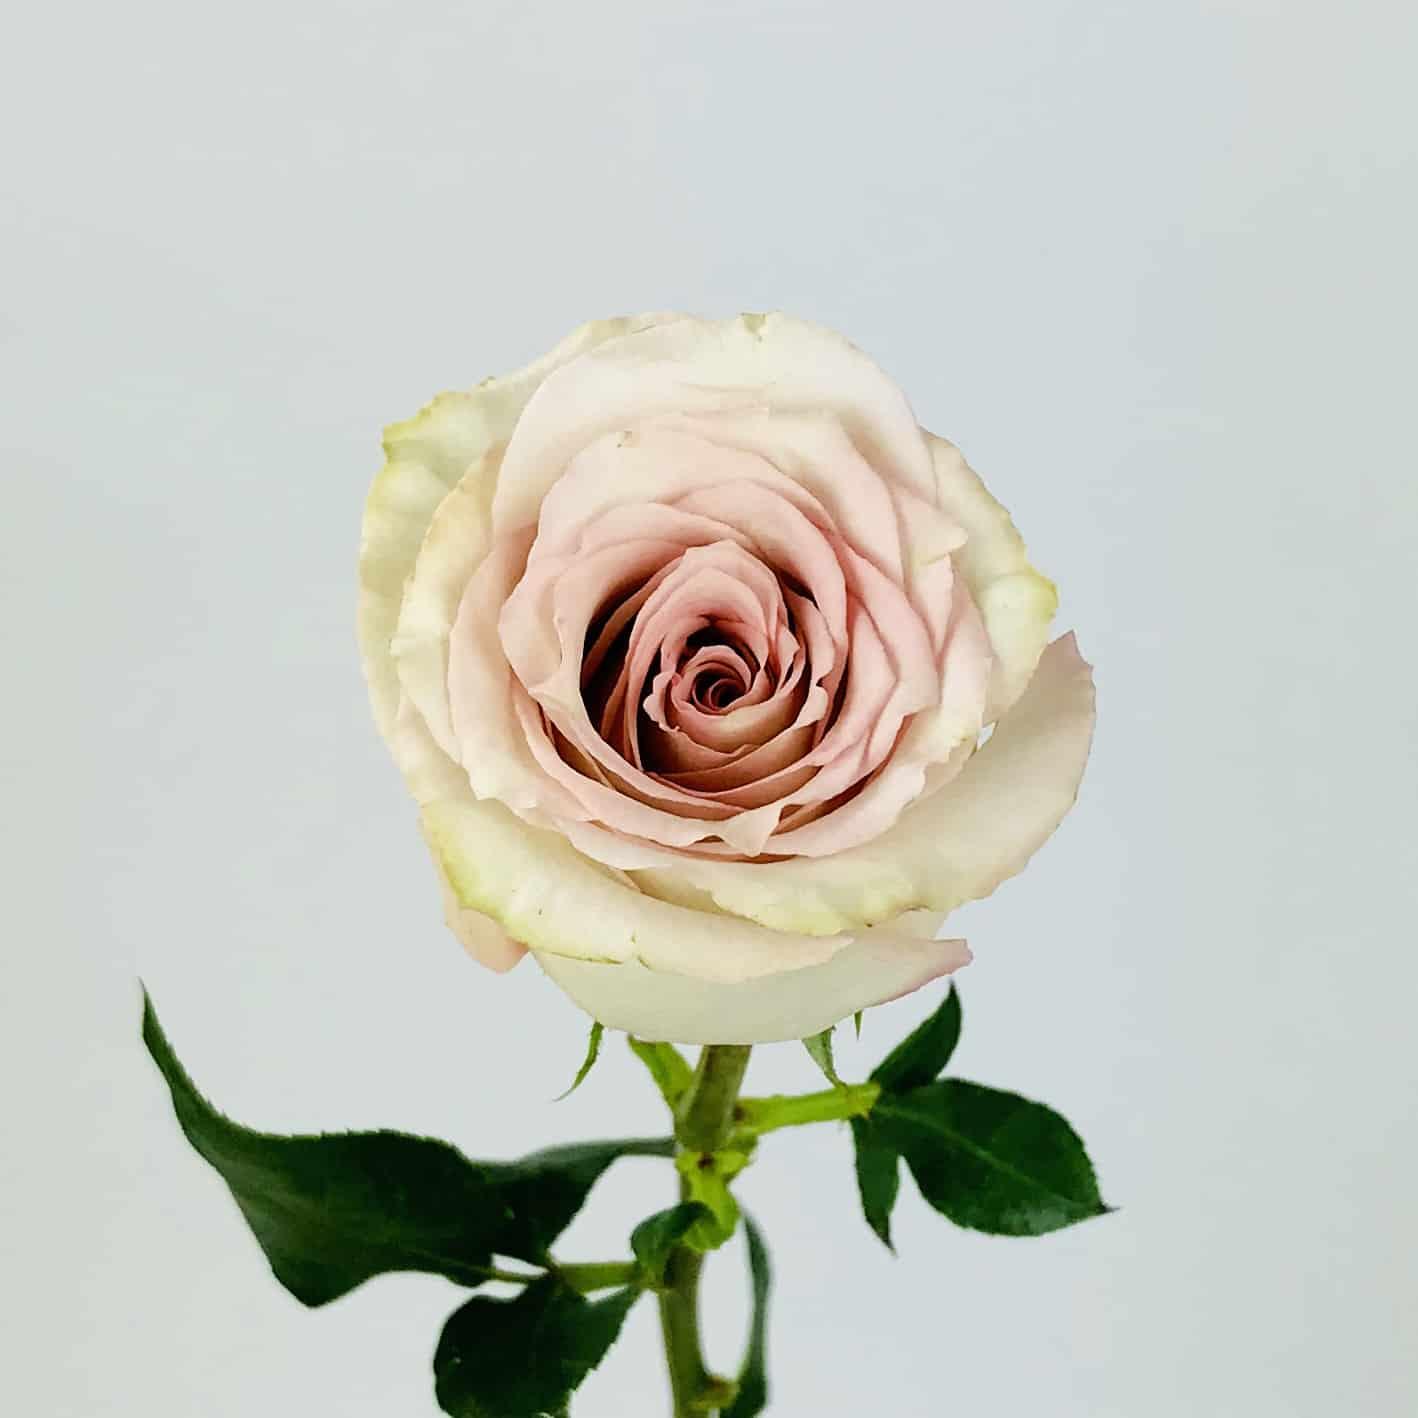 791c65048295 QUICKSAND ROSE - 50CM - Wholesale Bulk Flower Delivery